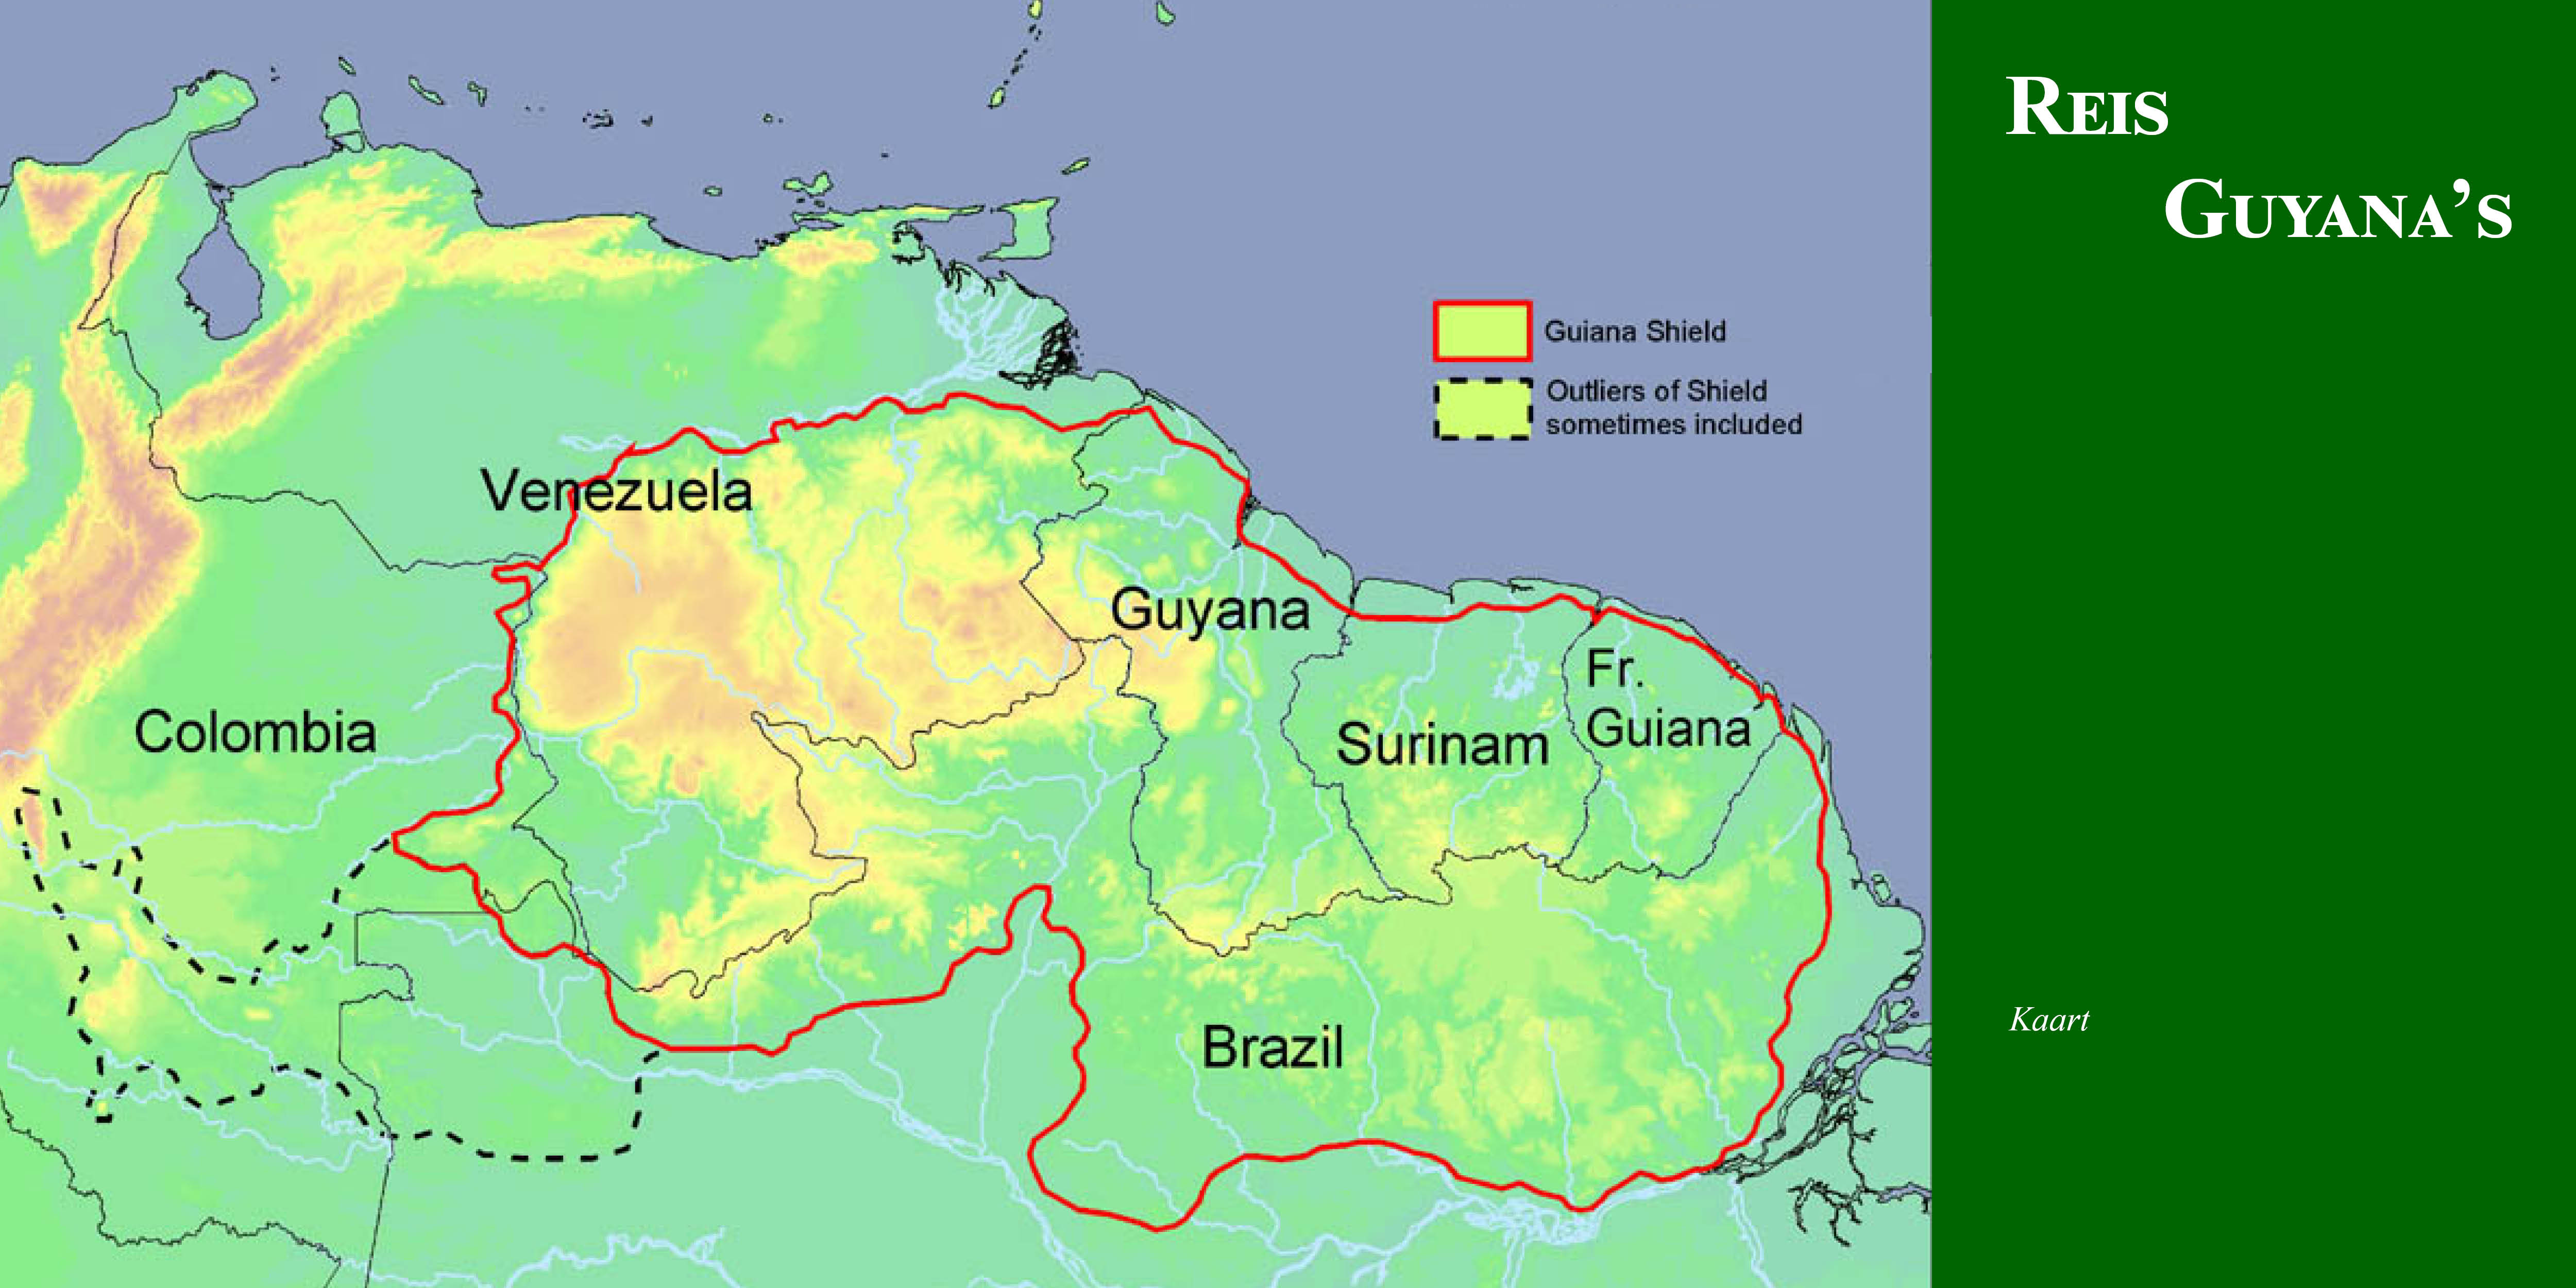 kaart guyana's